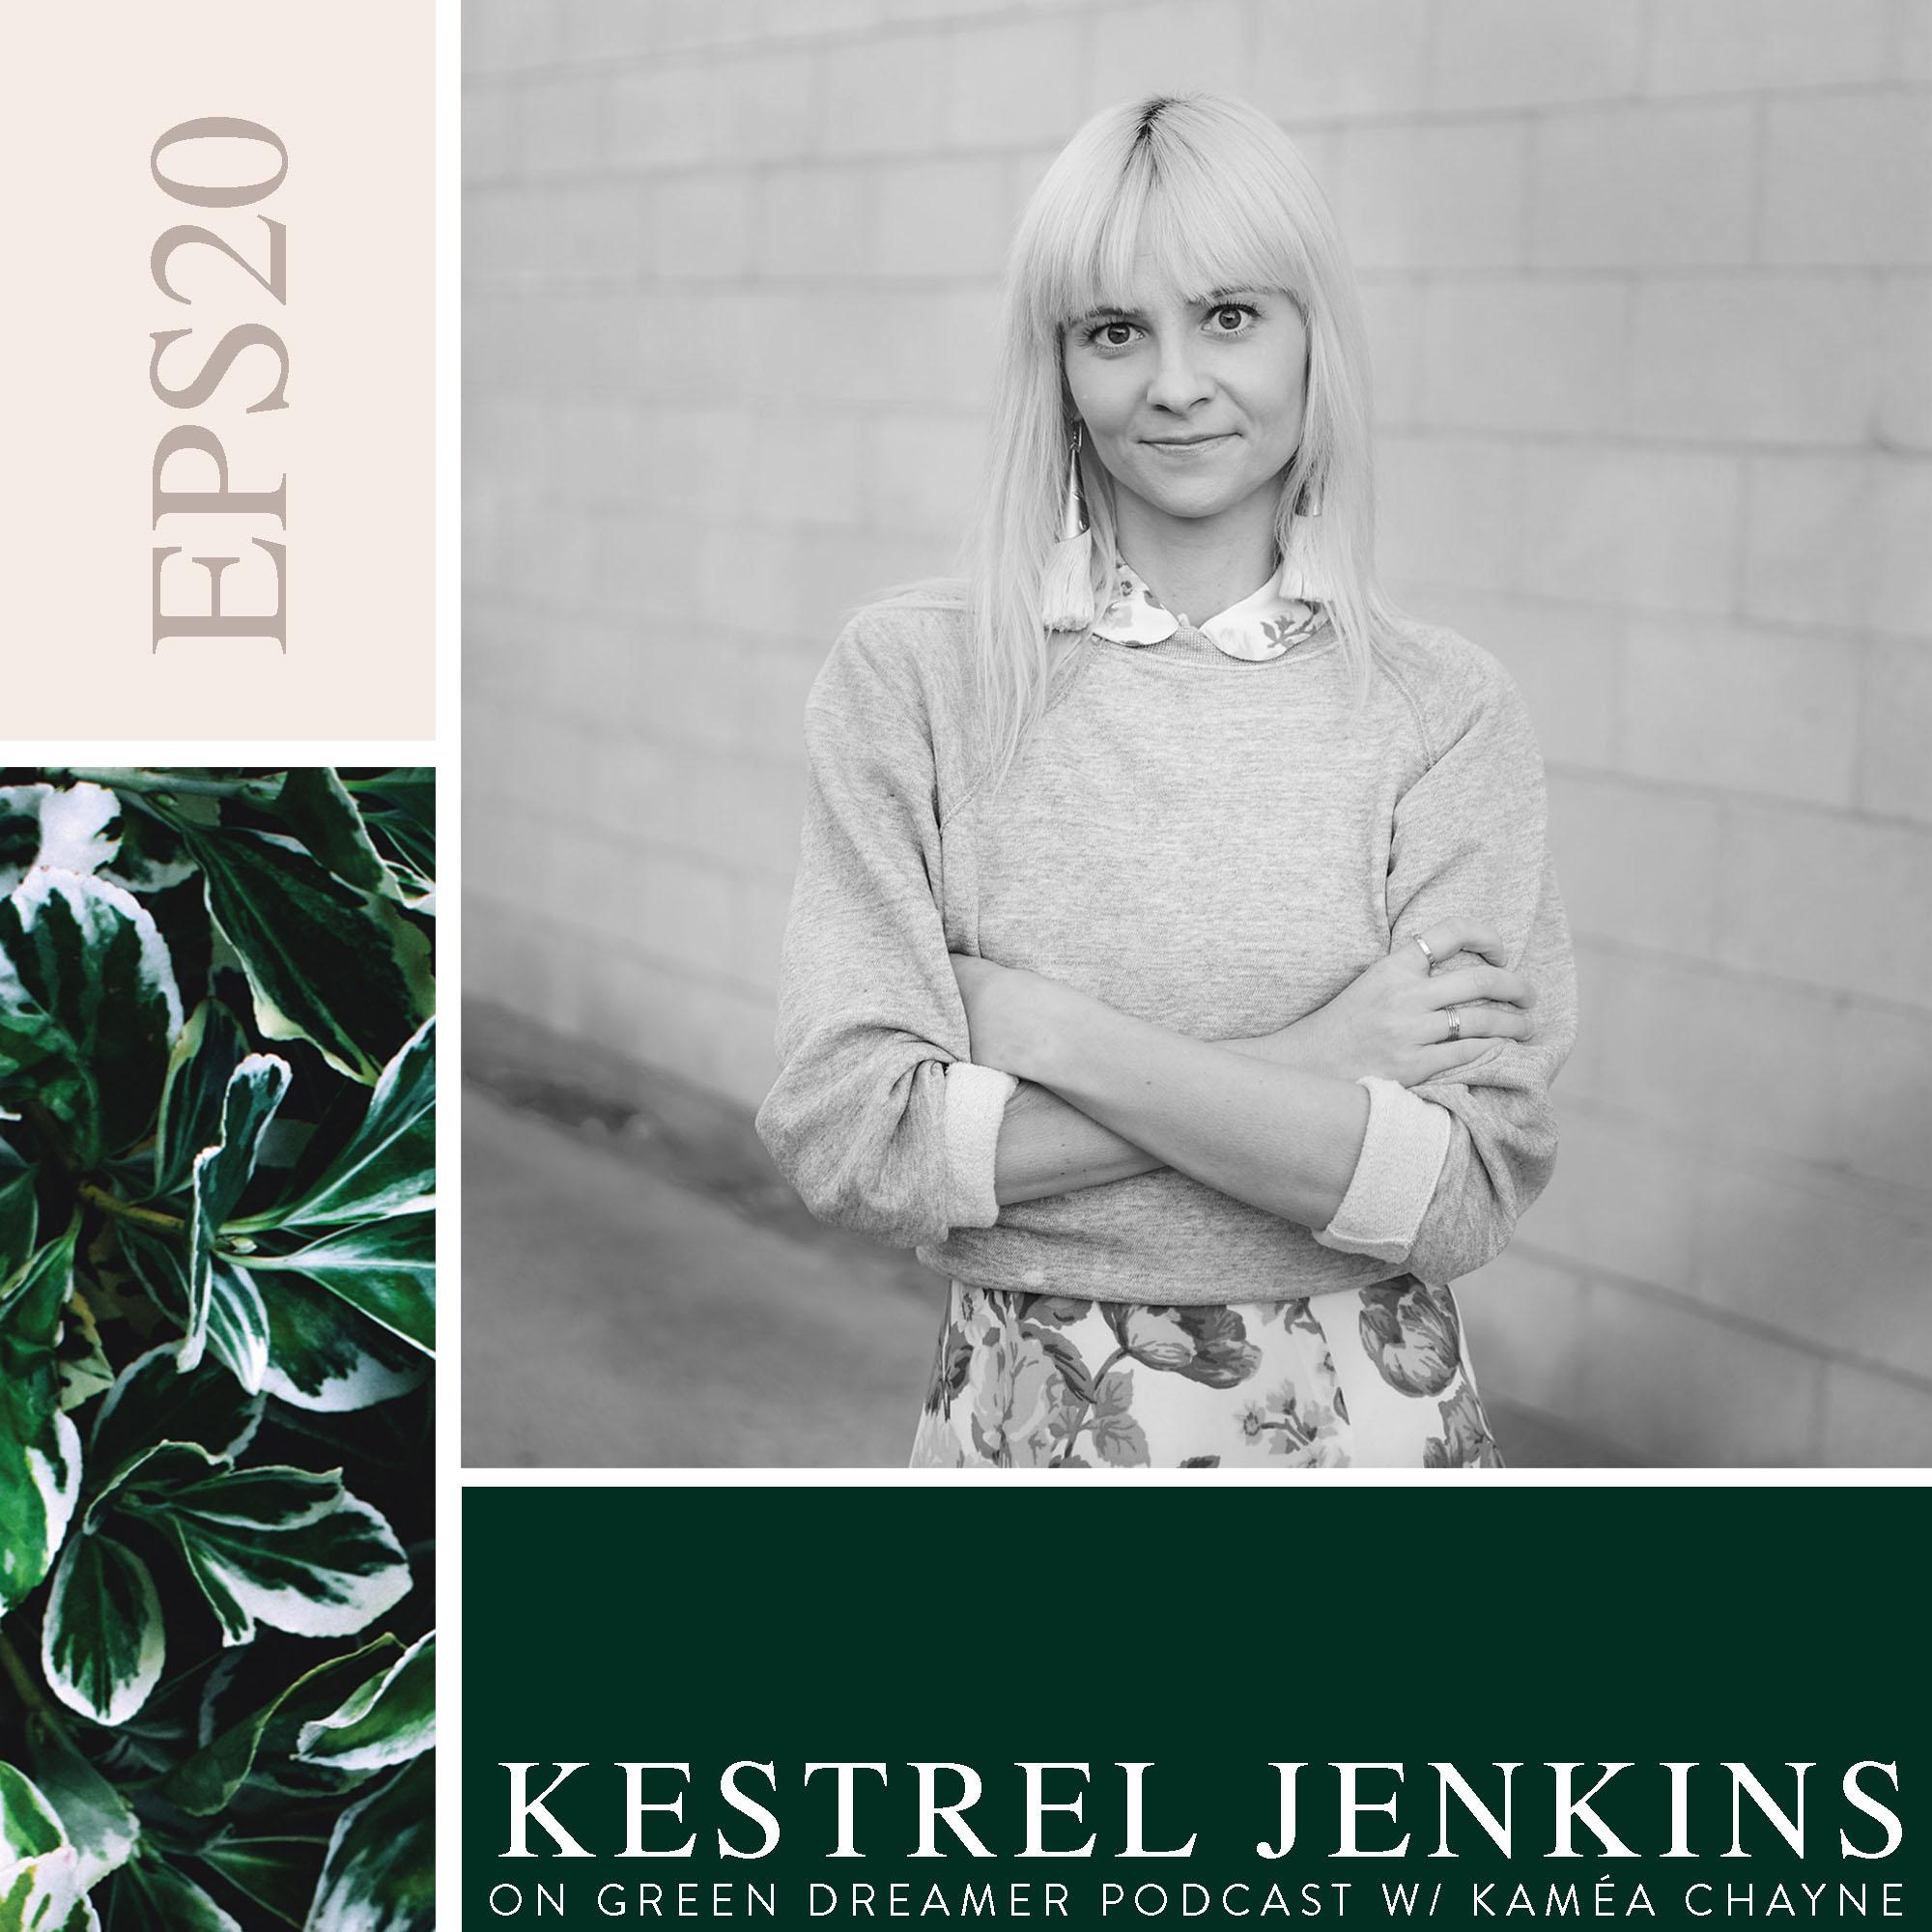 Kestrel Jenkins on Sustainability via Green Dreamer Podcast with Kaméa Chayne